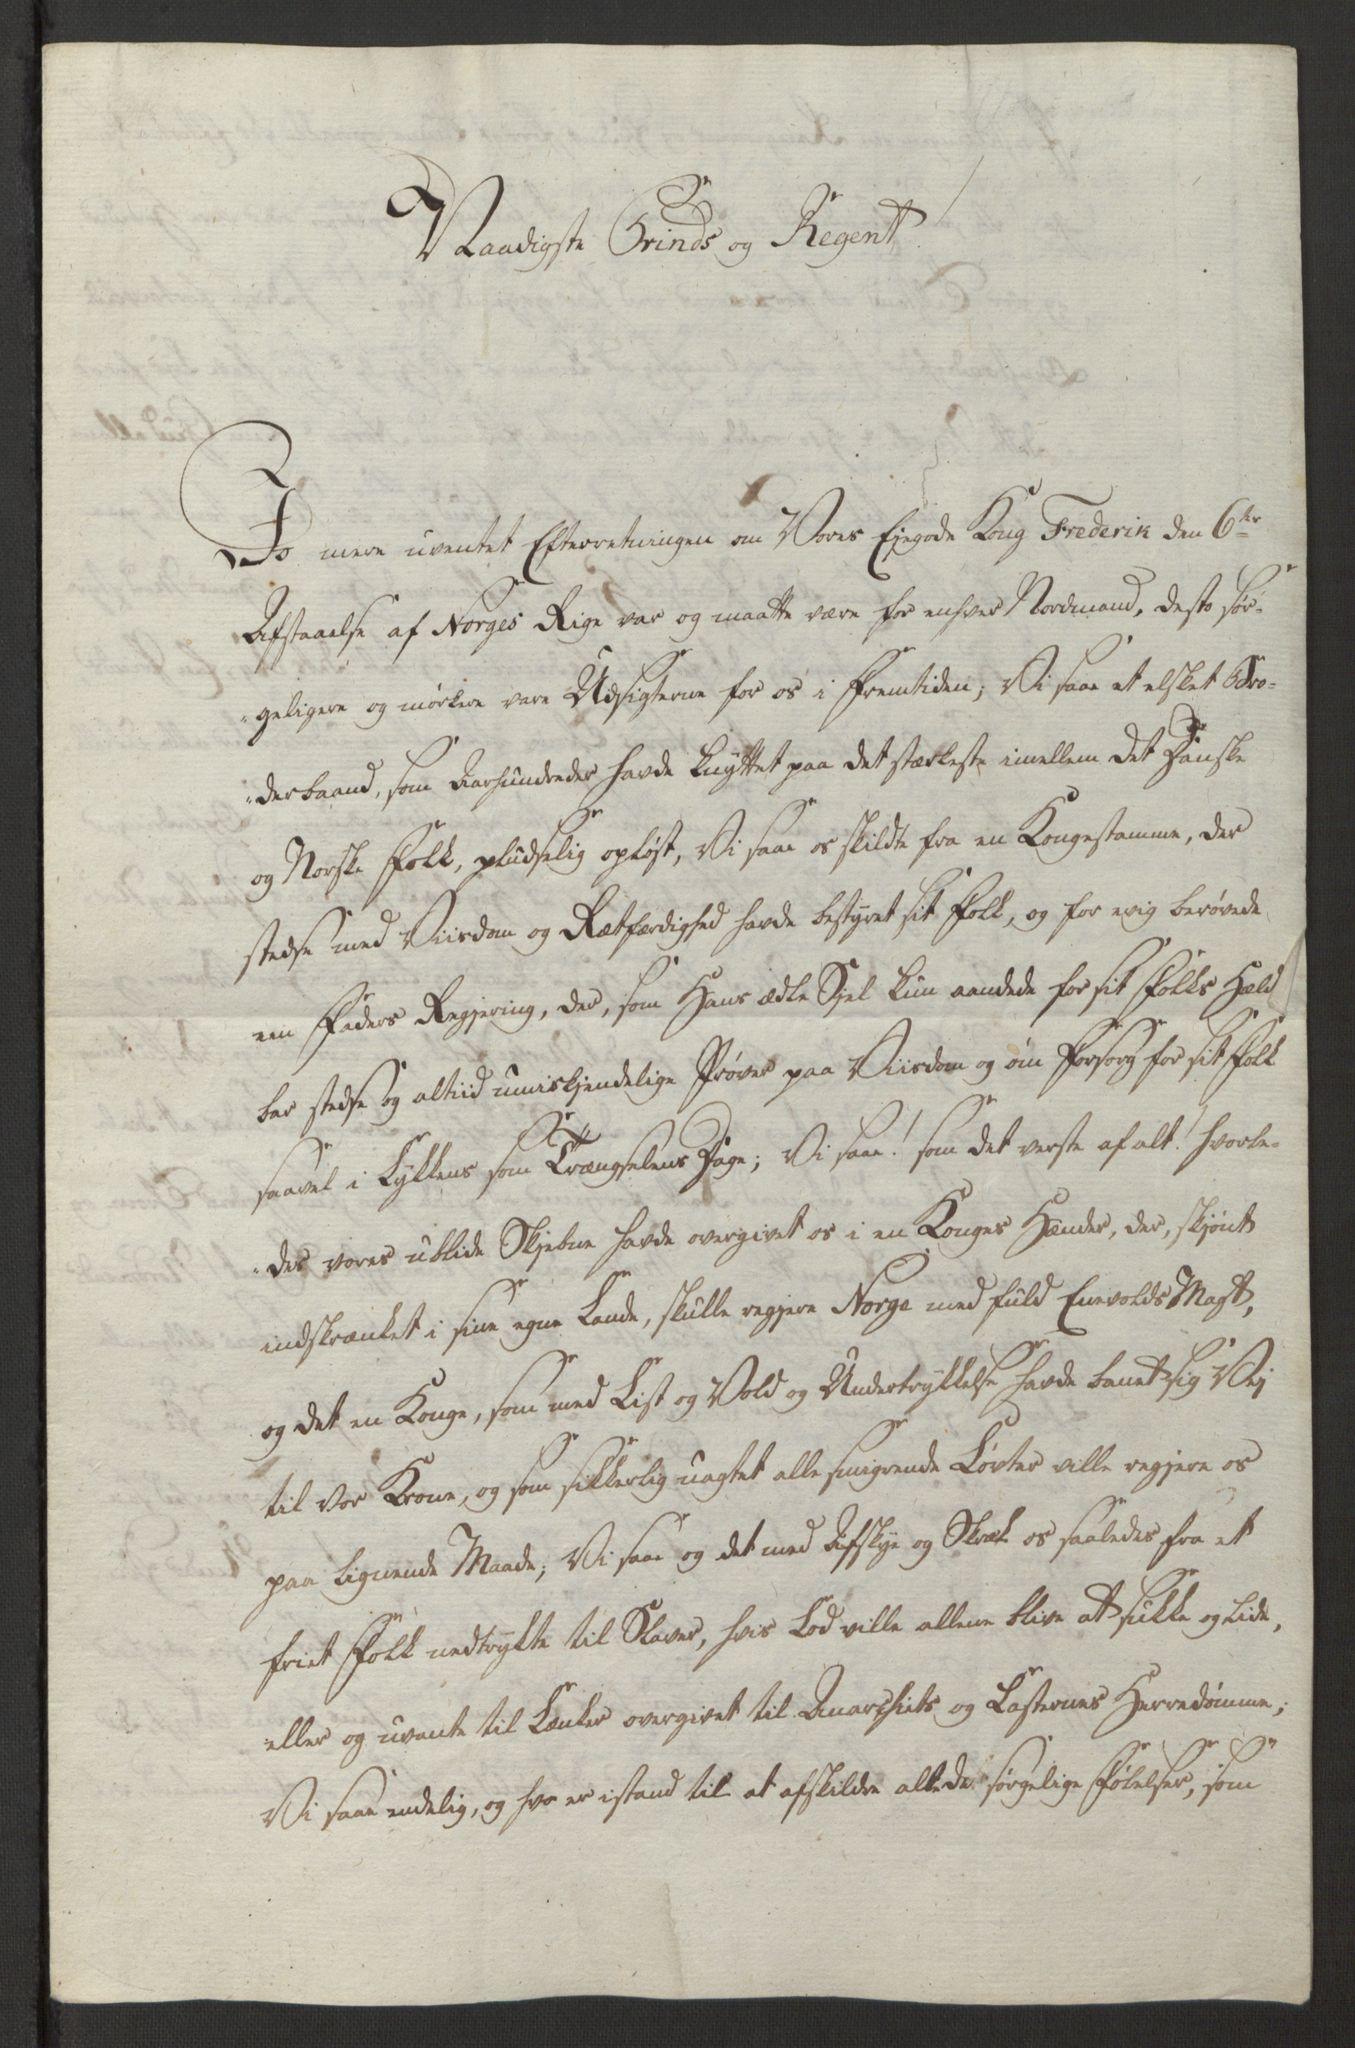 SAT, Nordland amt/fylke*, 1814, s. 47